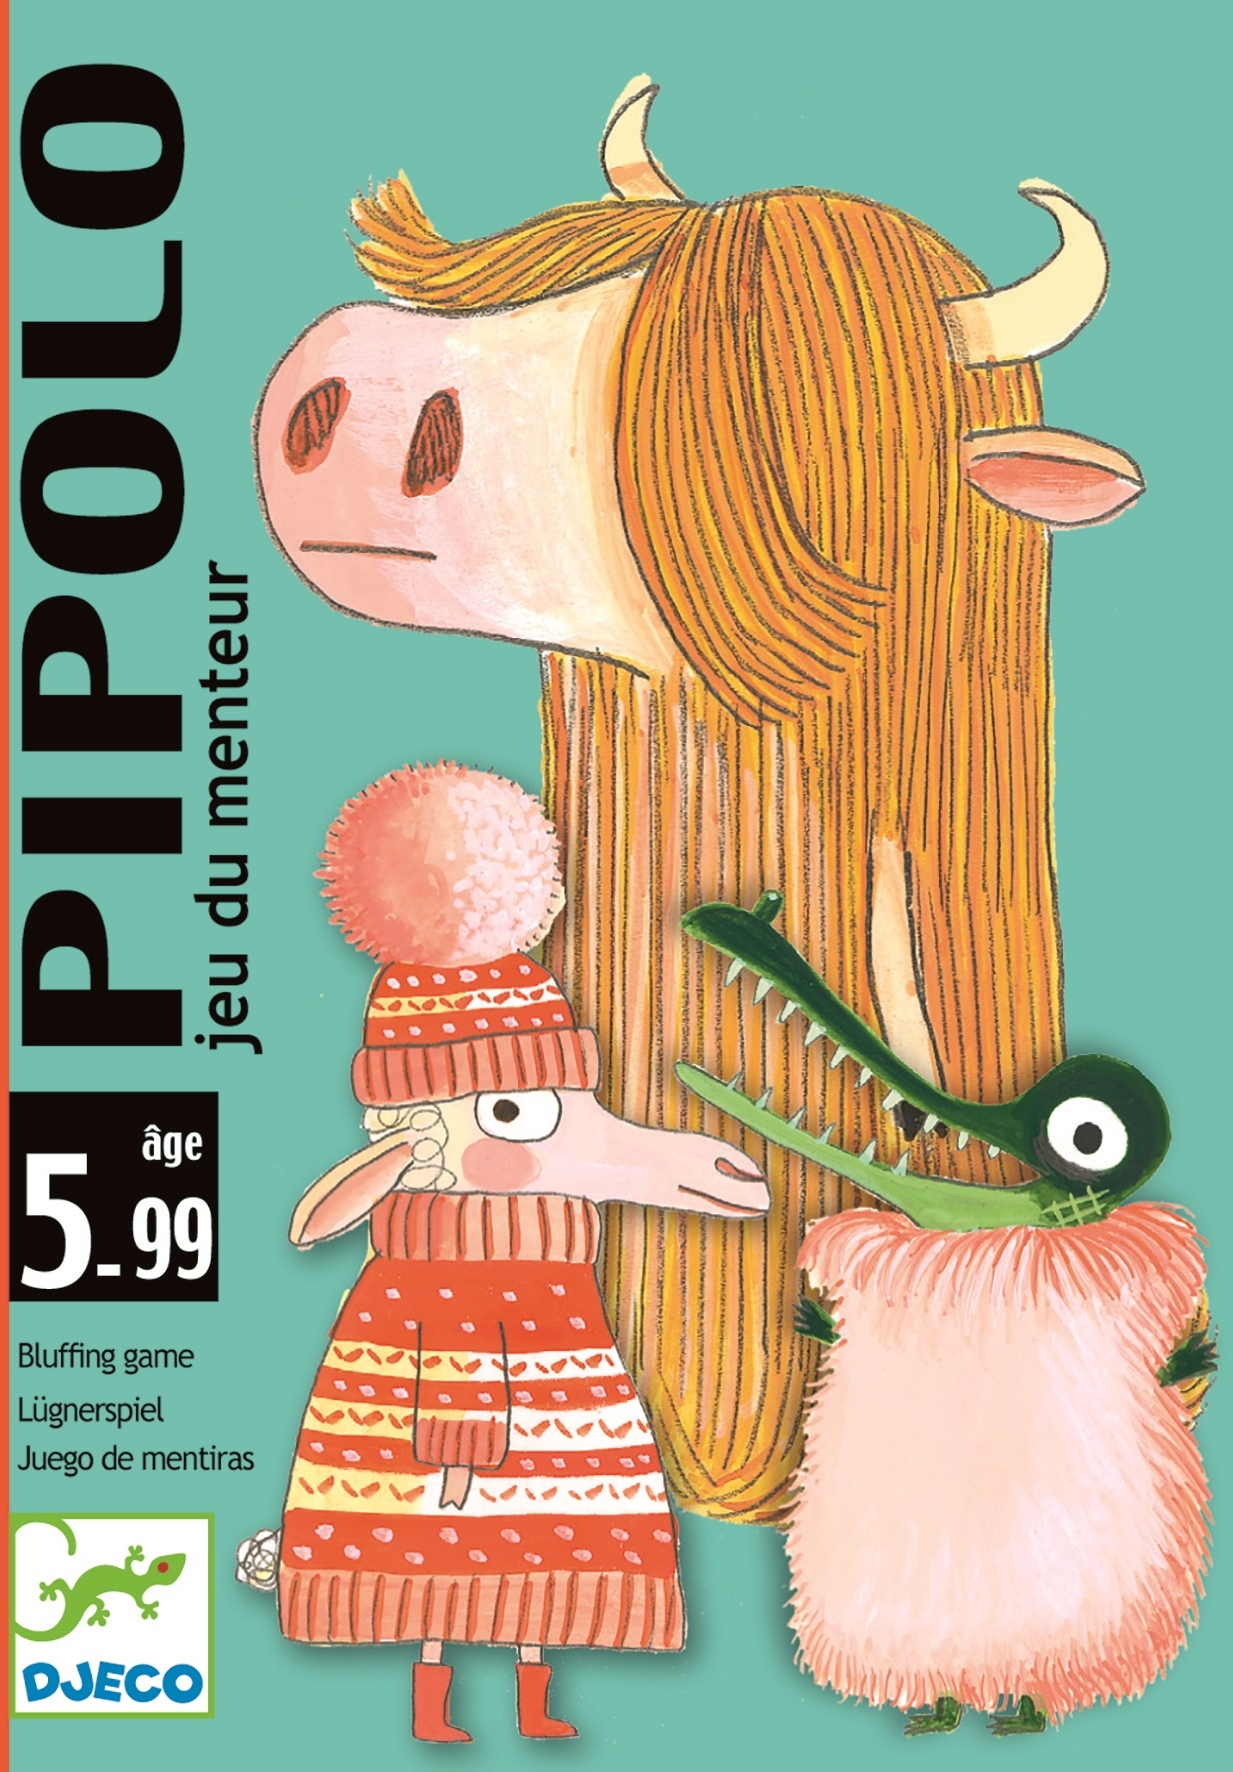 Karetní hra Djeco - Pipolo Djeco